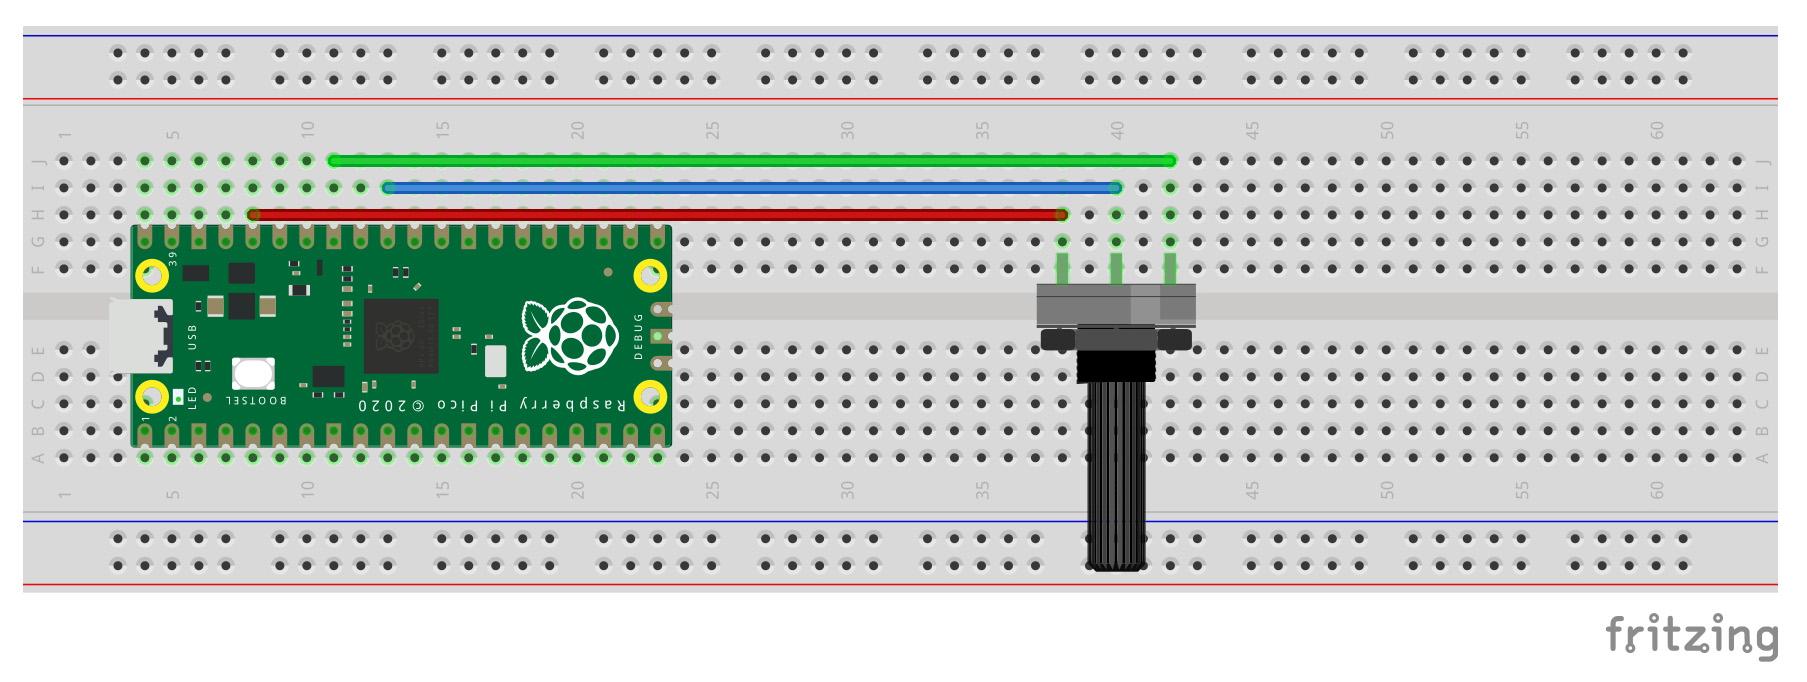 Get Started with Raspberry Pi Pico GPIO & MicroPython circuit